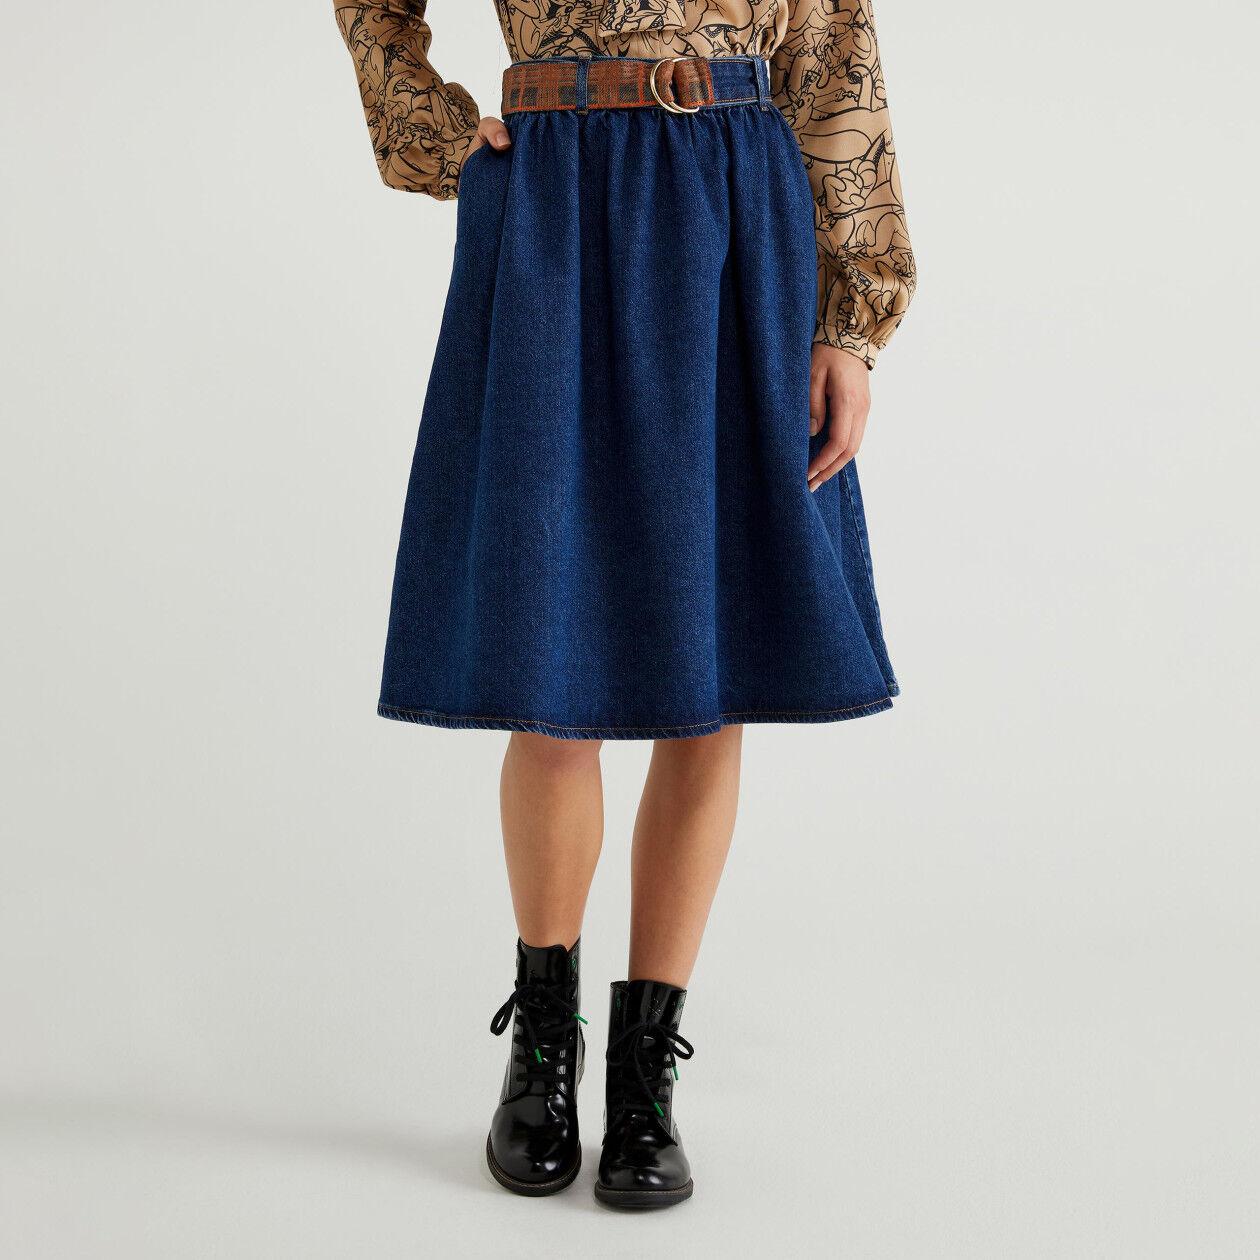 Jean skirt with belt